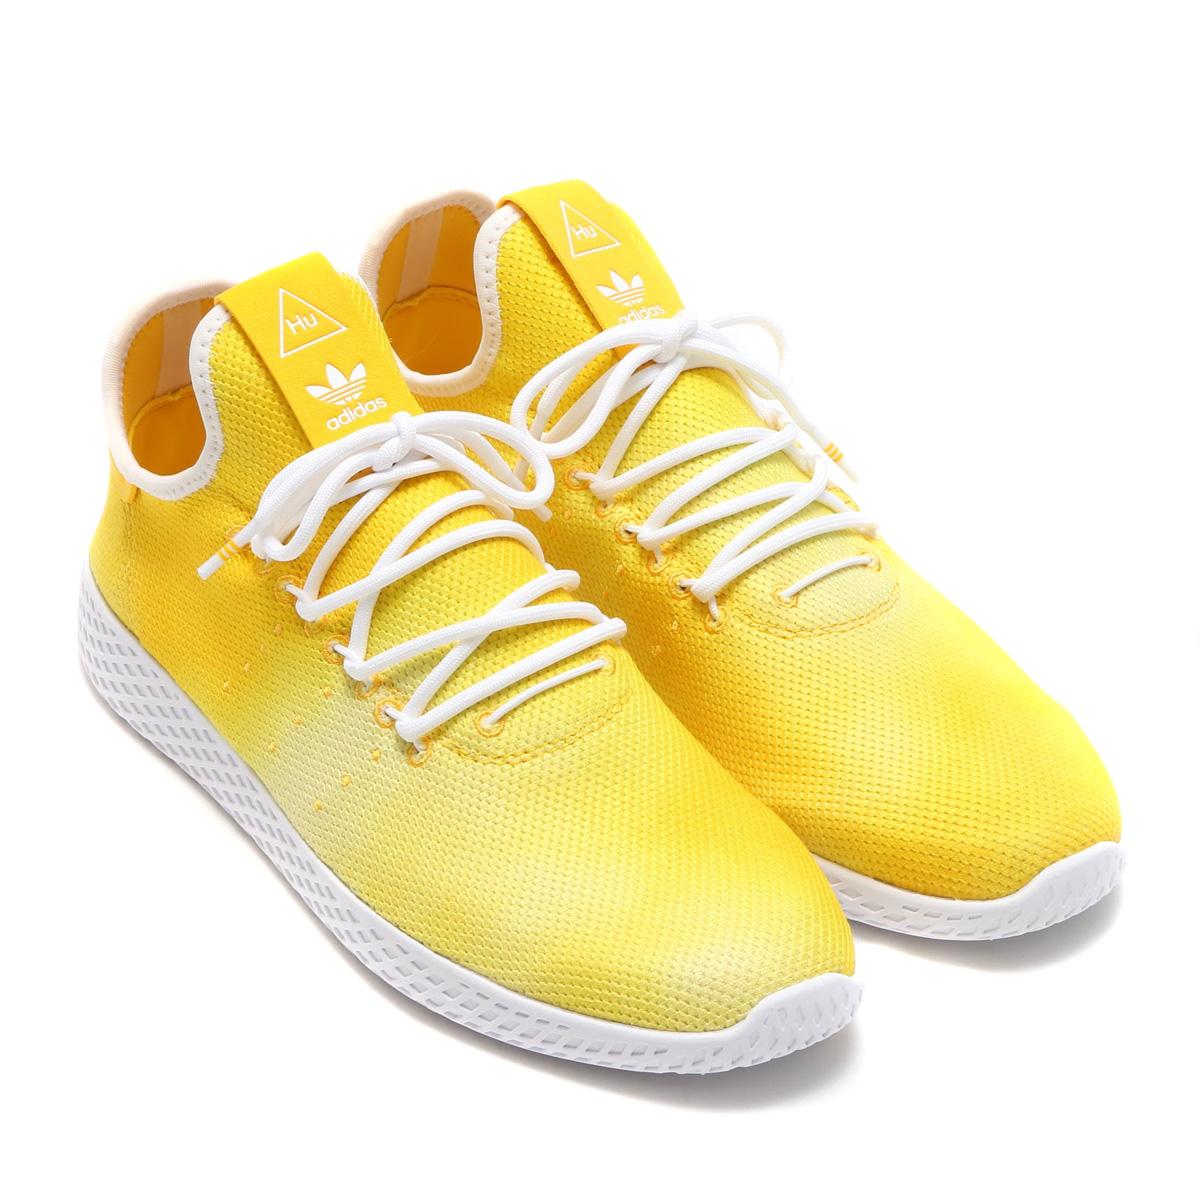 adidas Originals PW HU HOLI TENNIS HU (Adidas originals Farrell Williams HU HOLI tennis HU) Running White Running White Running White 18SS S